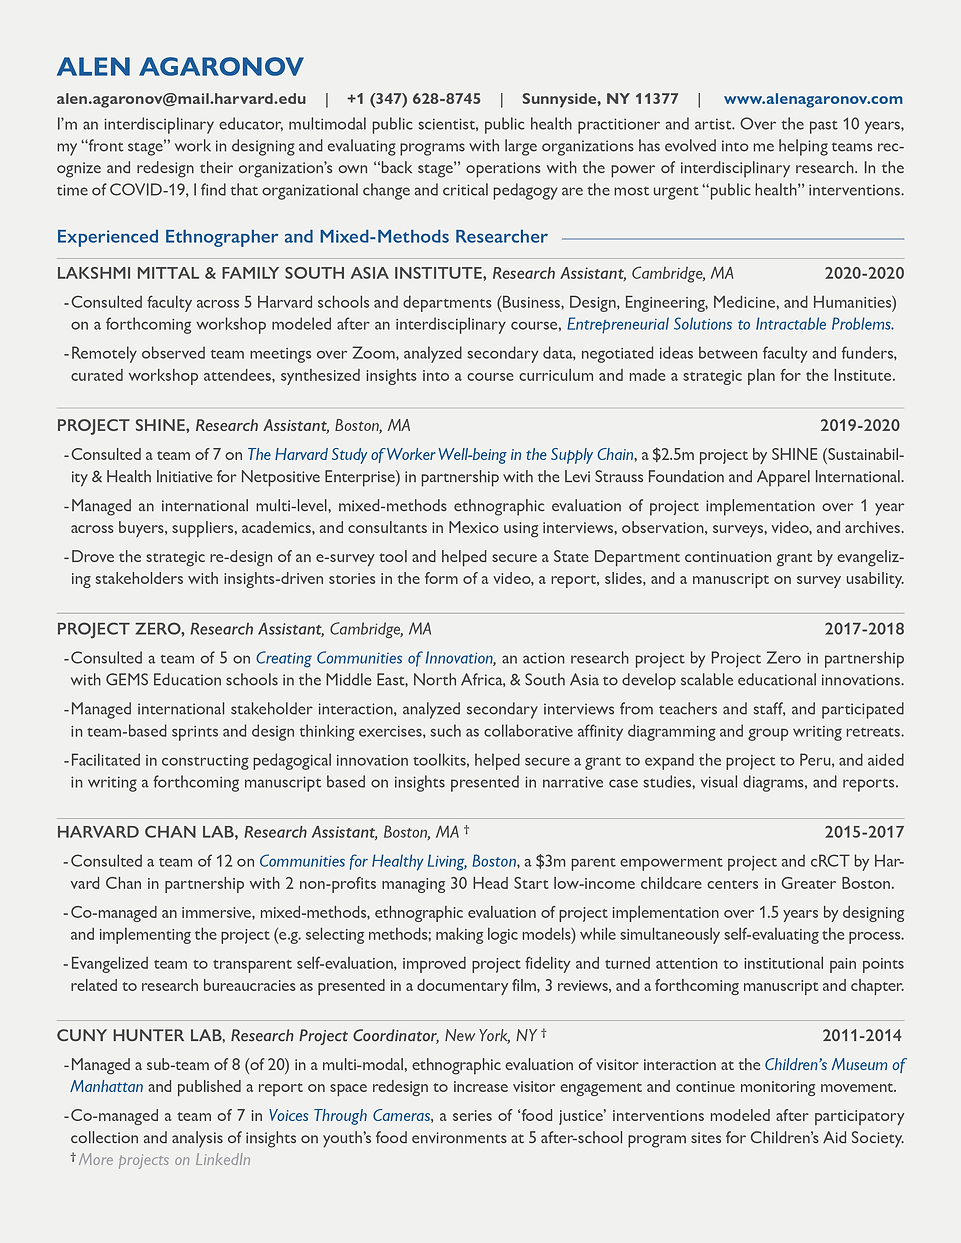 Resume_v2.2 - page 1.png